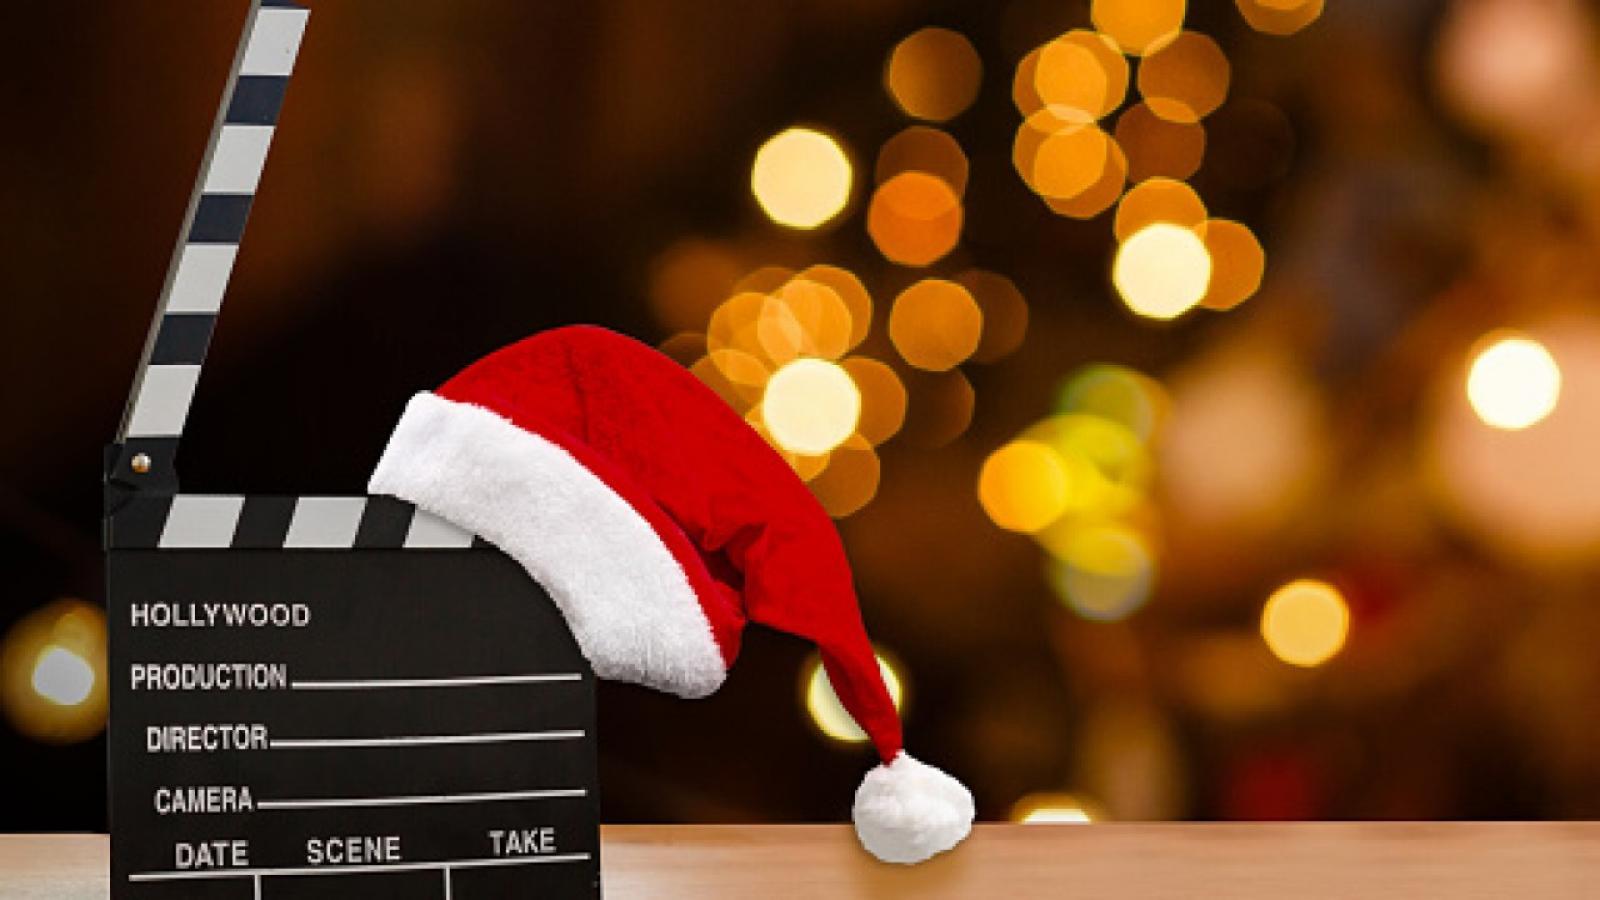 STARZPLAY kicks off the holiday season with festive content